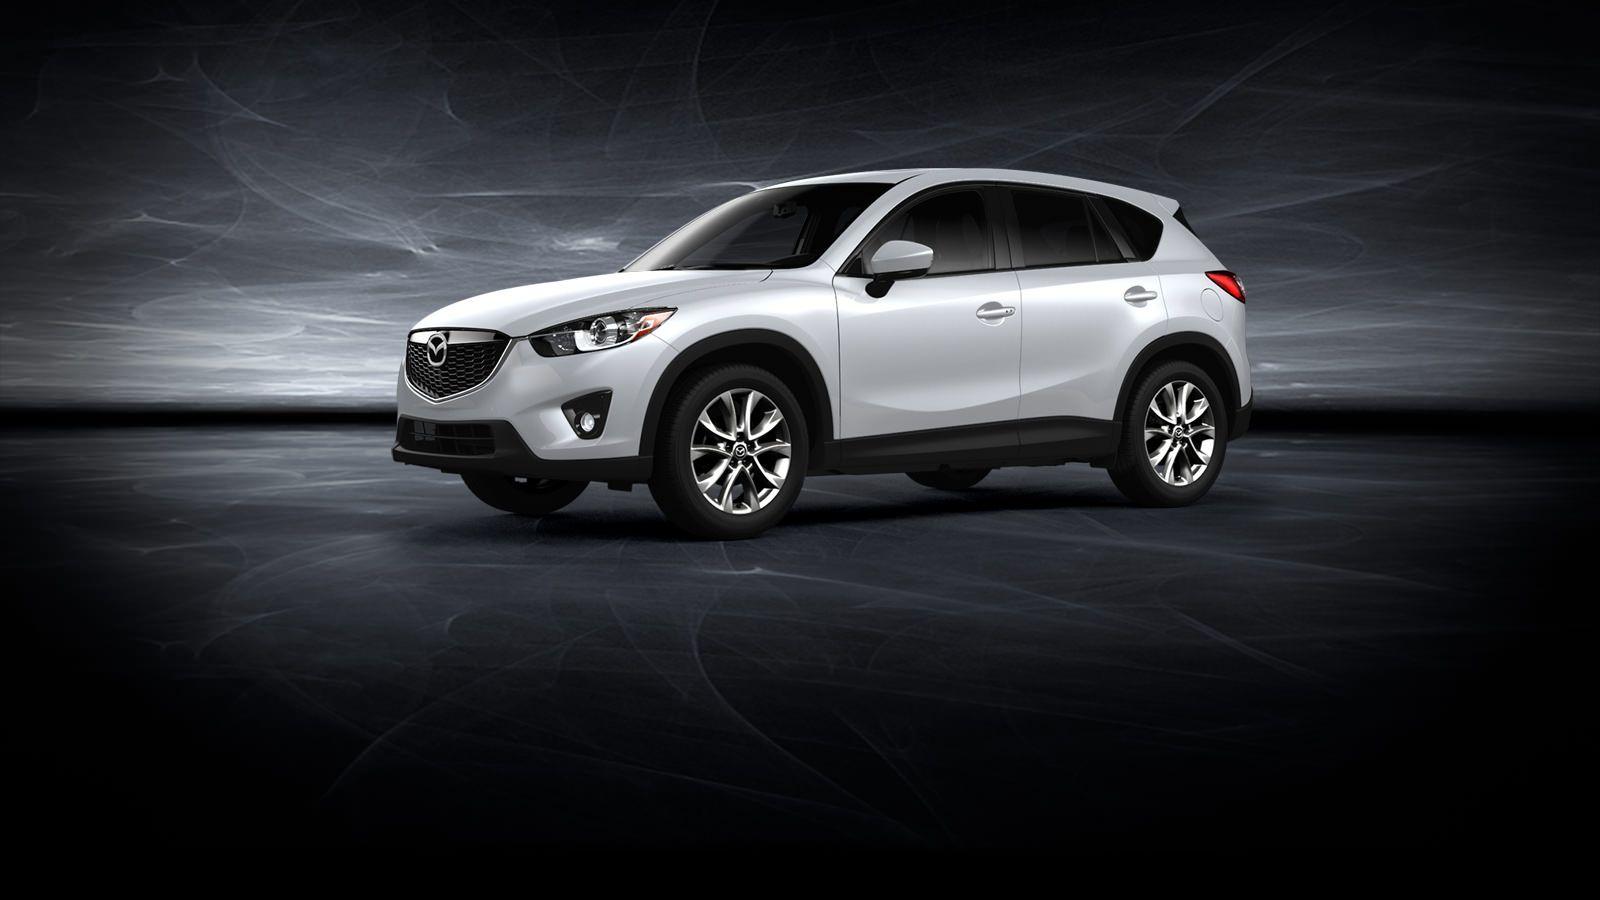 2015 Mazda Cx 5 Compact Crossover Suv Fuel Efficient Suv Mazda